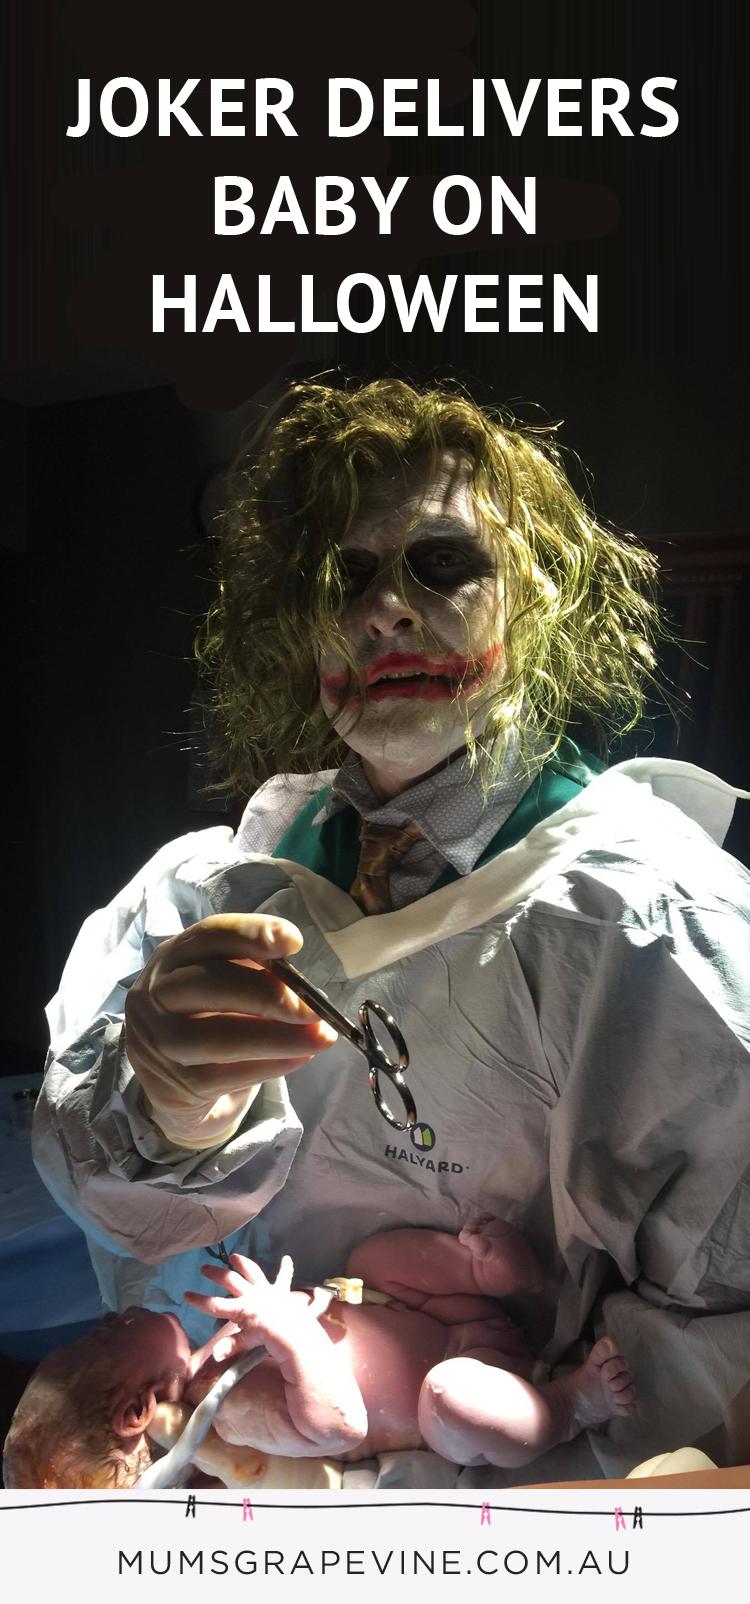 The Joker OB delivering a baby